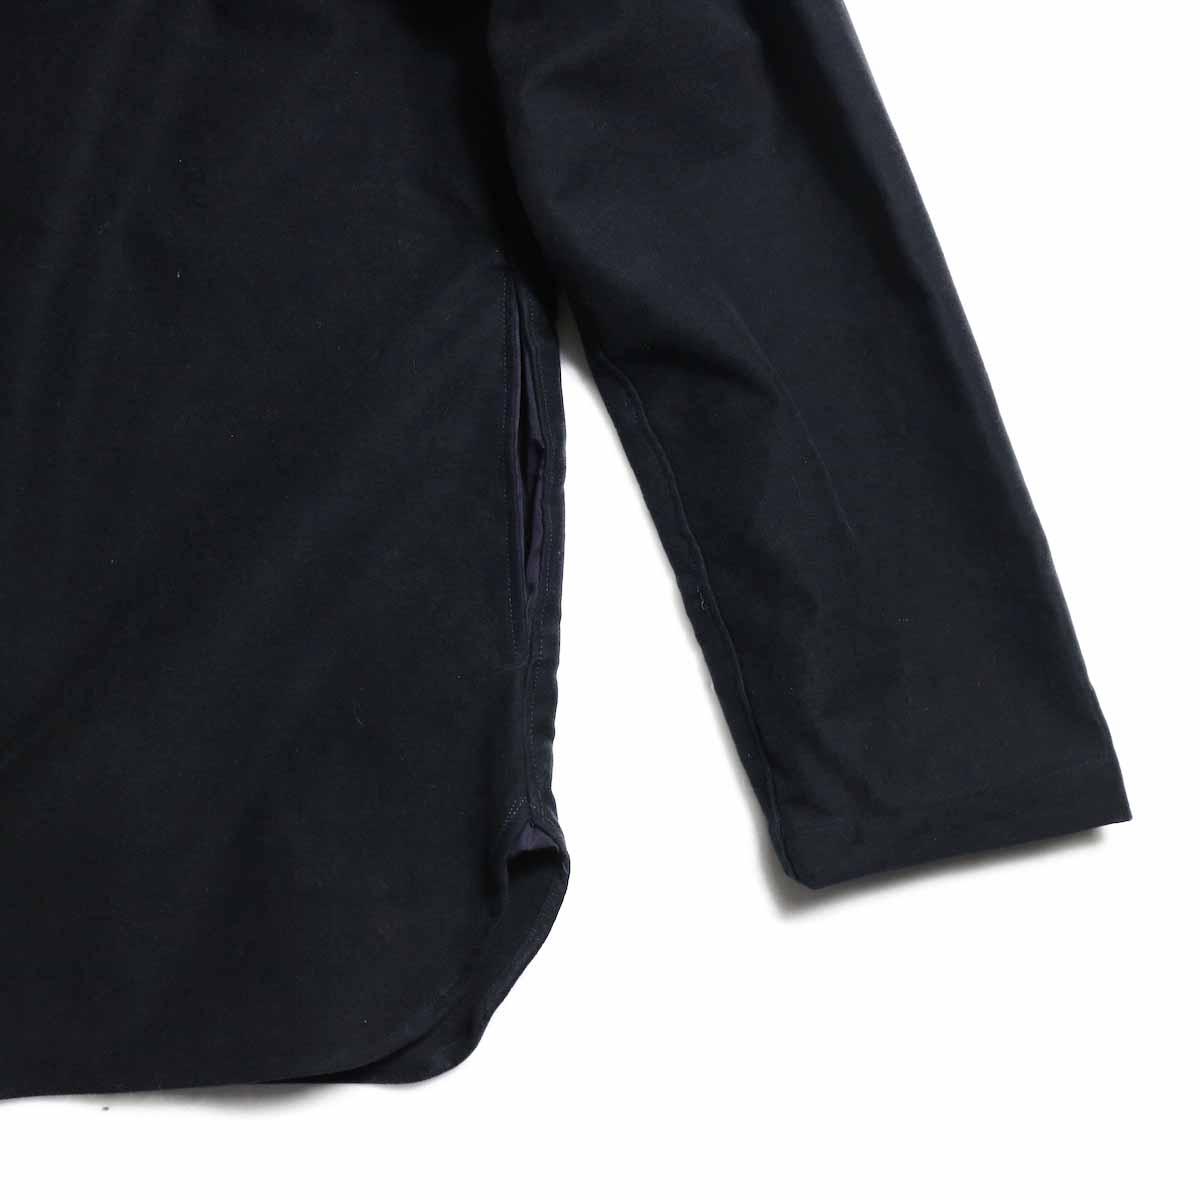 BRENA / Travail Key Smock -Navy 裾